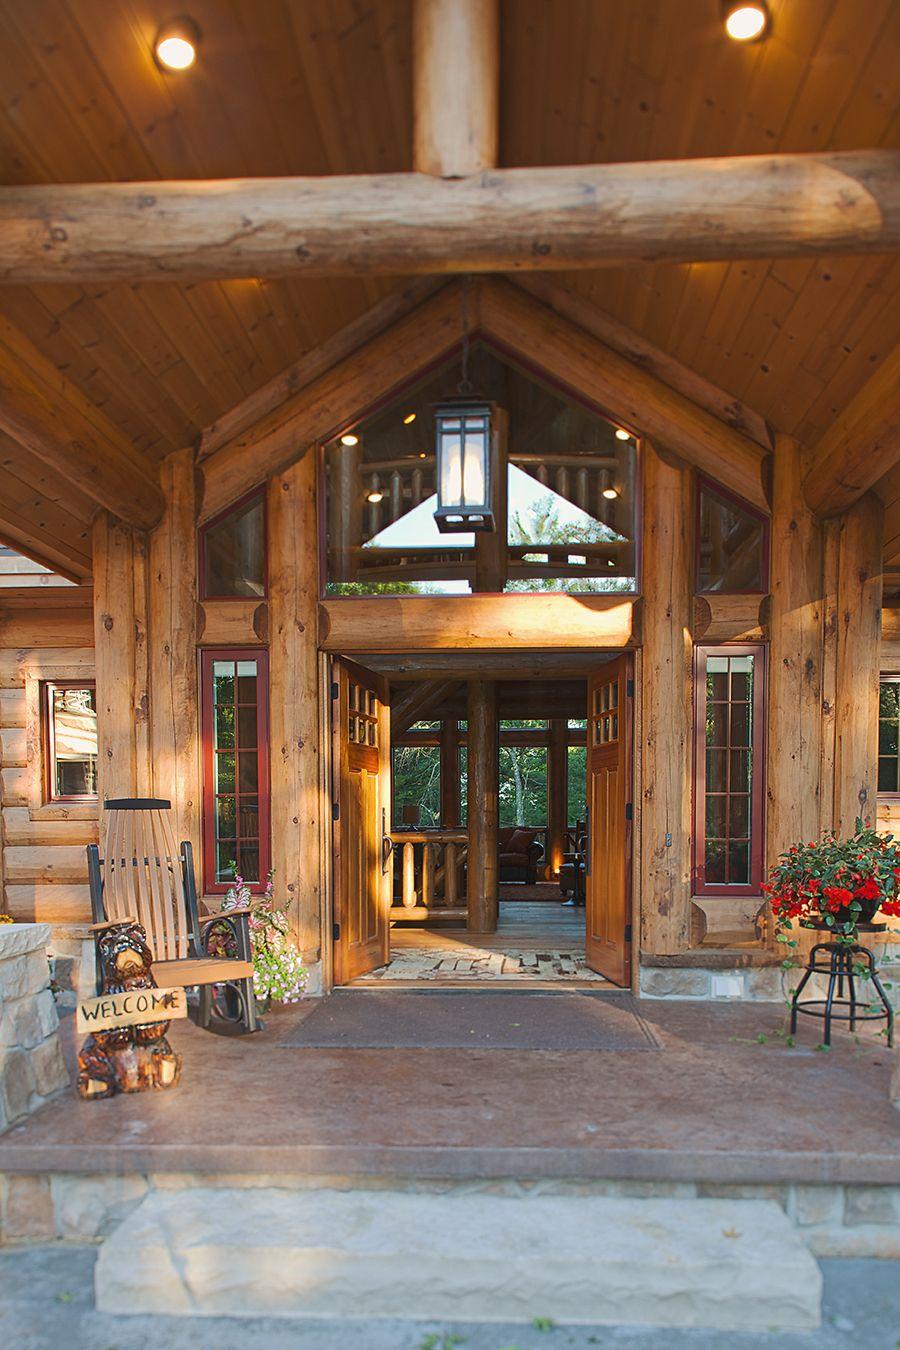 Compact Hybrid Timber Frame Home Design Photos Timber Home Living: Wisconsin Log Homes National Design & Build Services For Custom Log & Timber Frame Homes Www